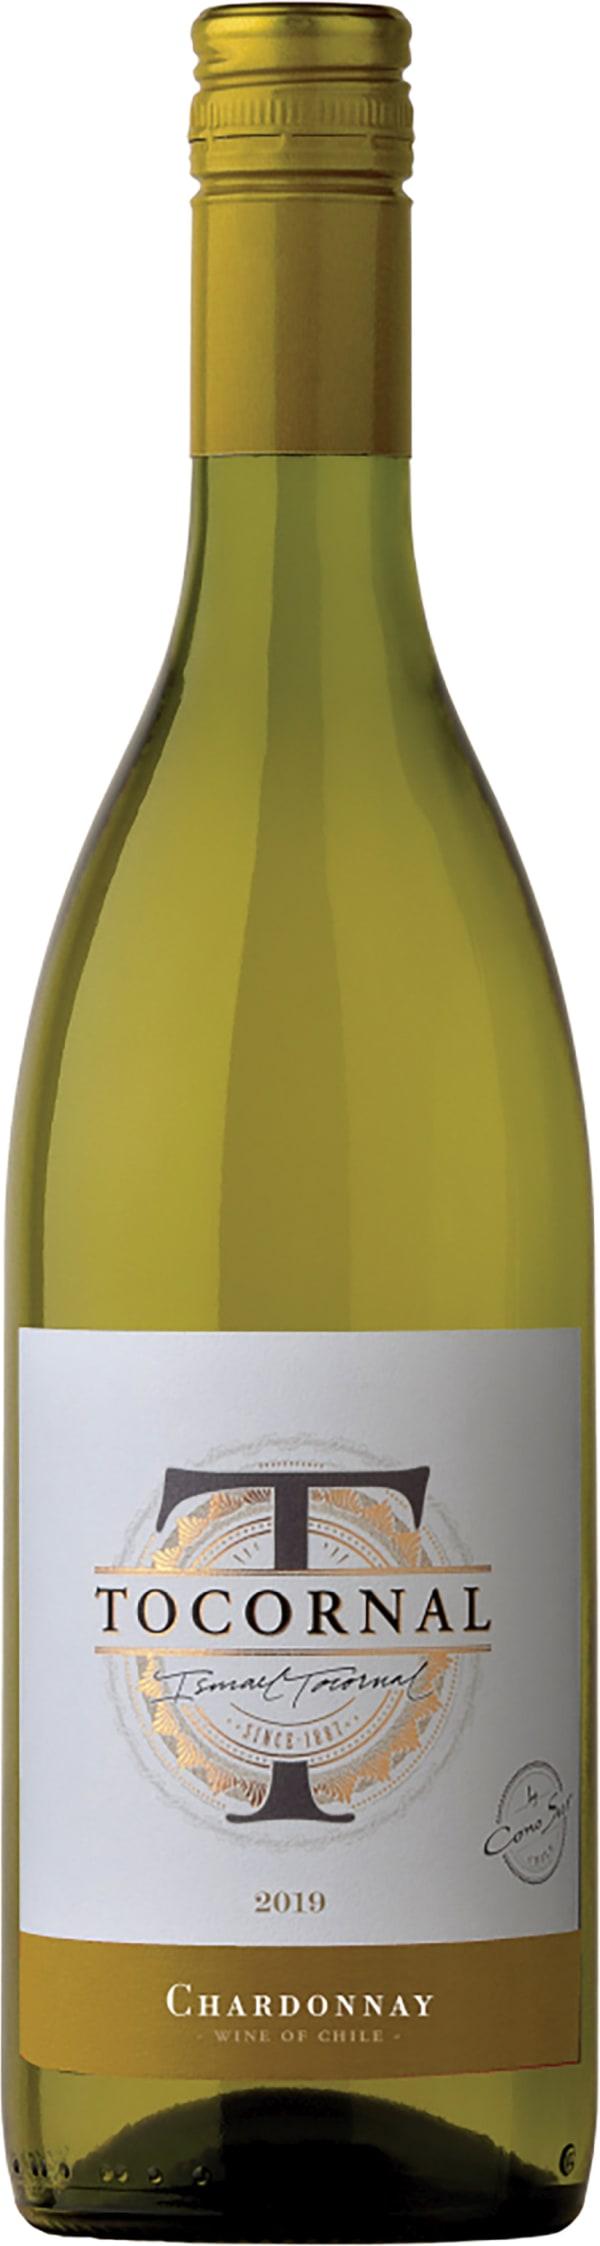 Cono Sur Tocornal Chardonnay 2018